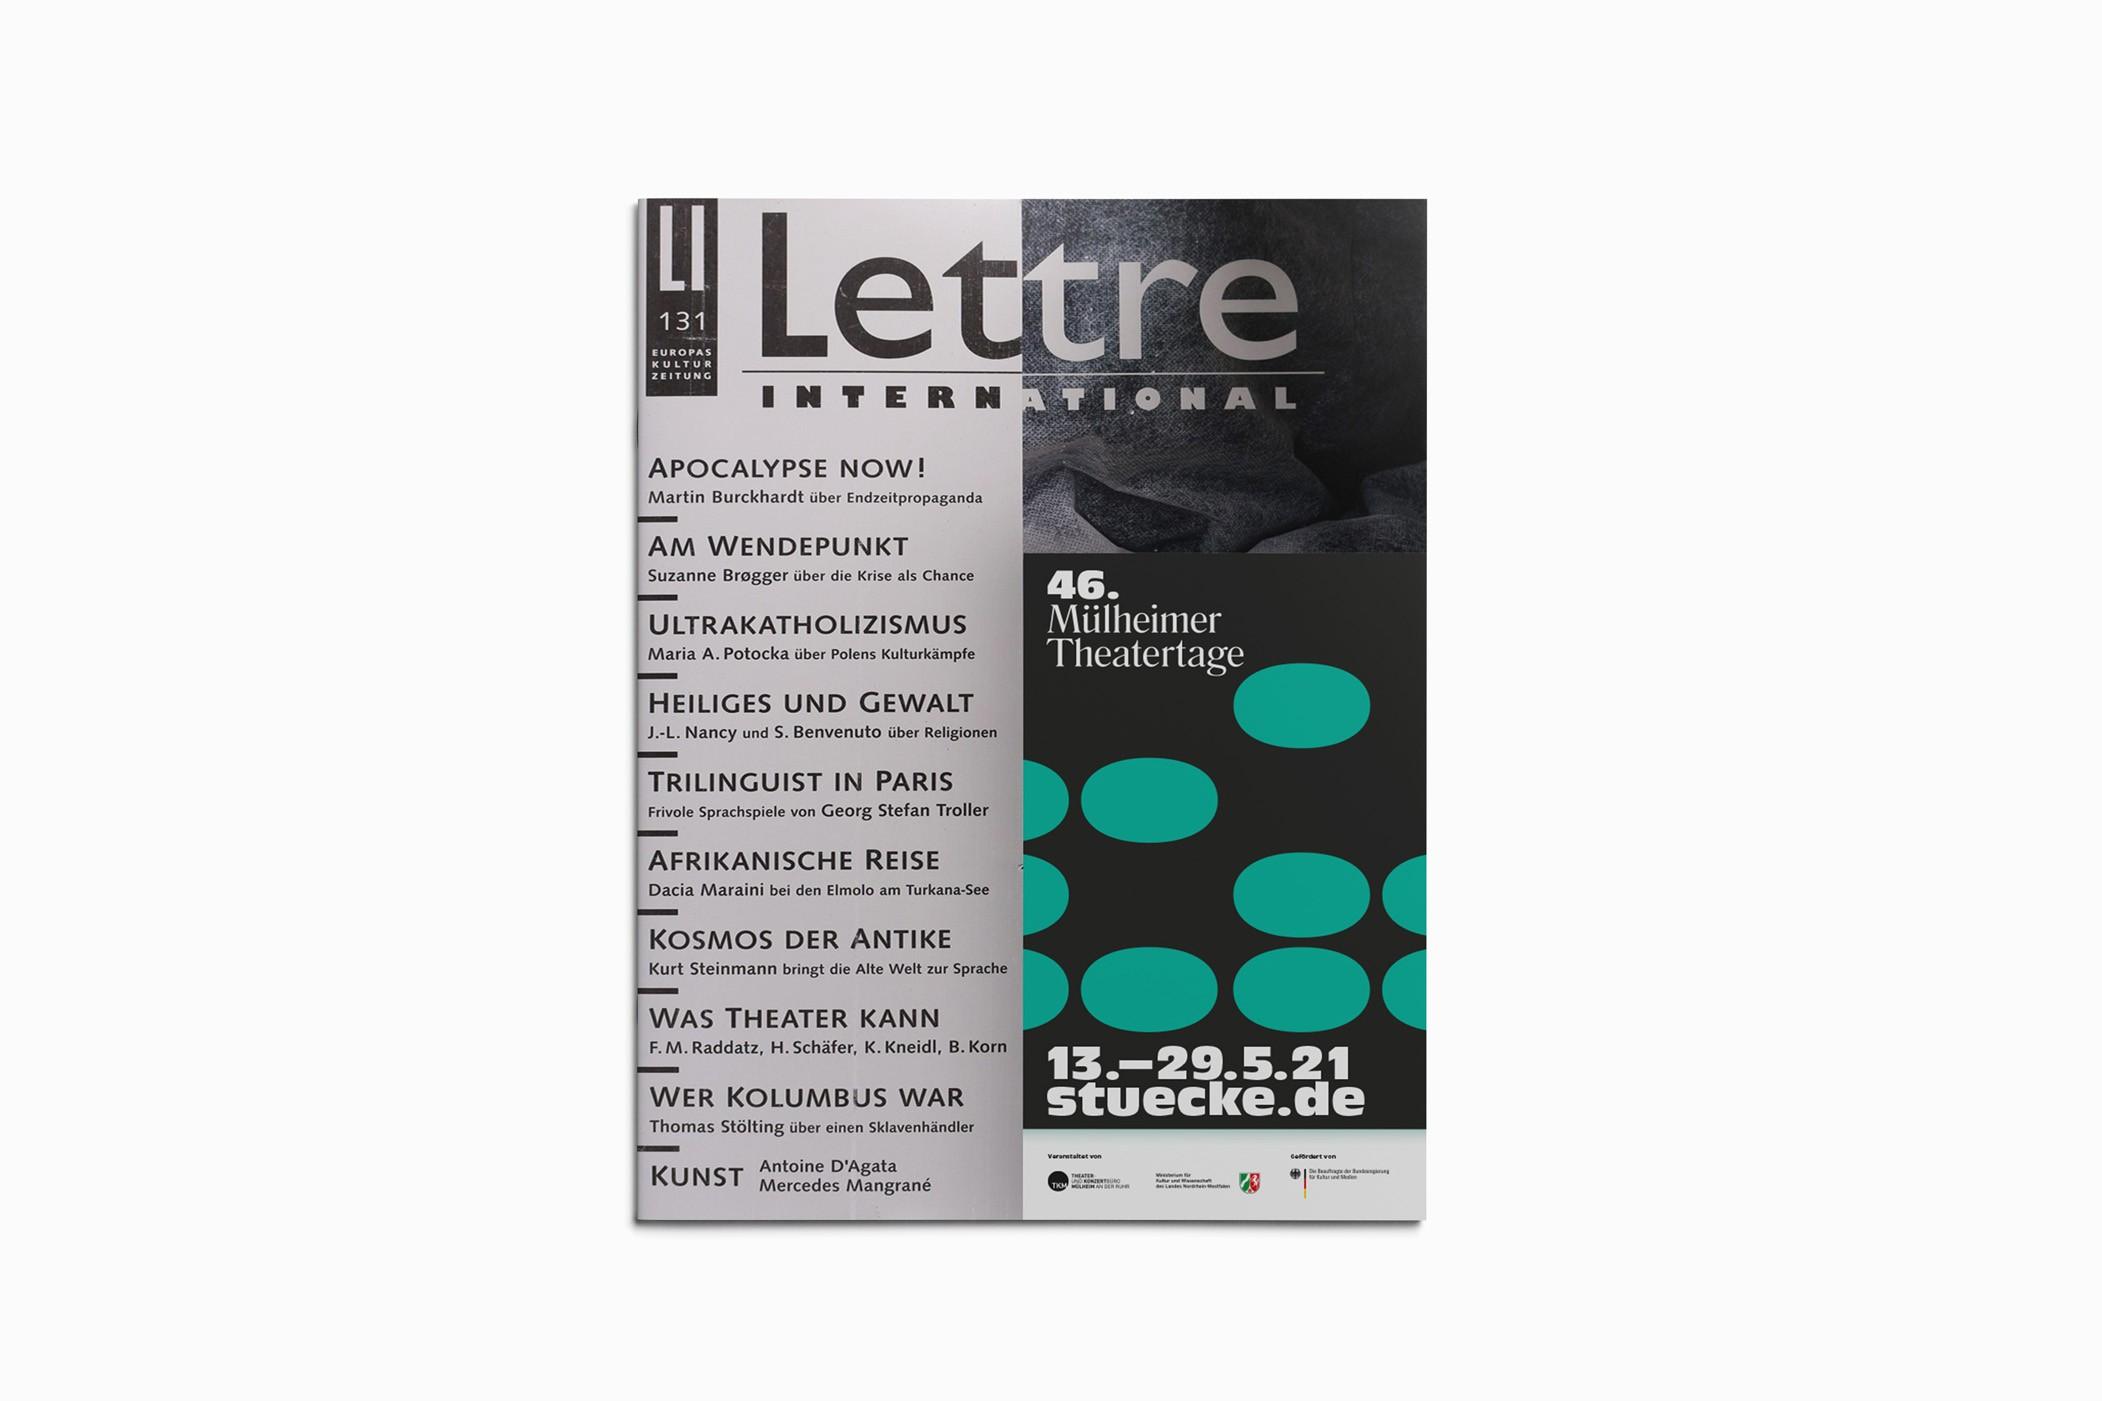 Lettre   Anzeige   Theater  Kultur